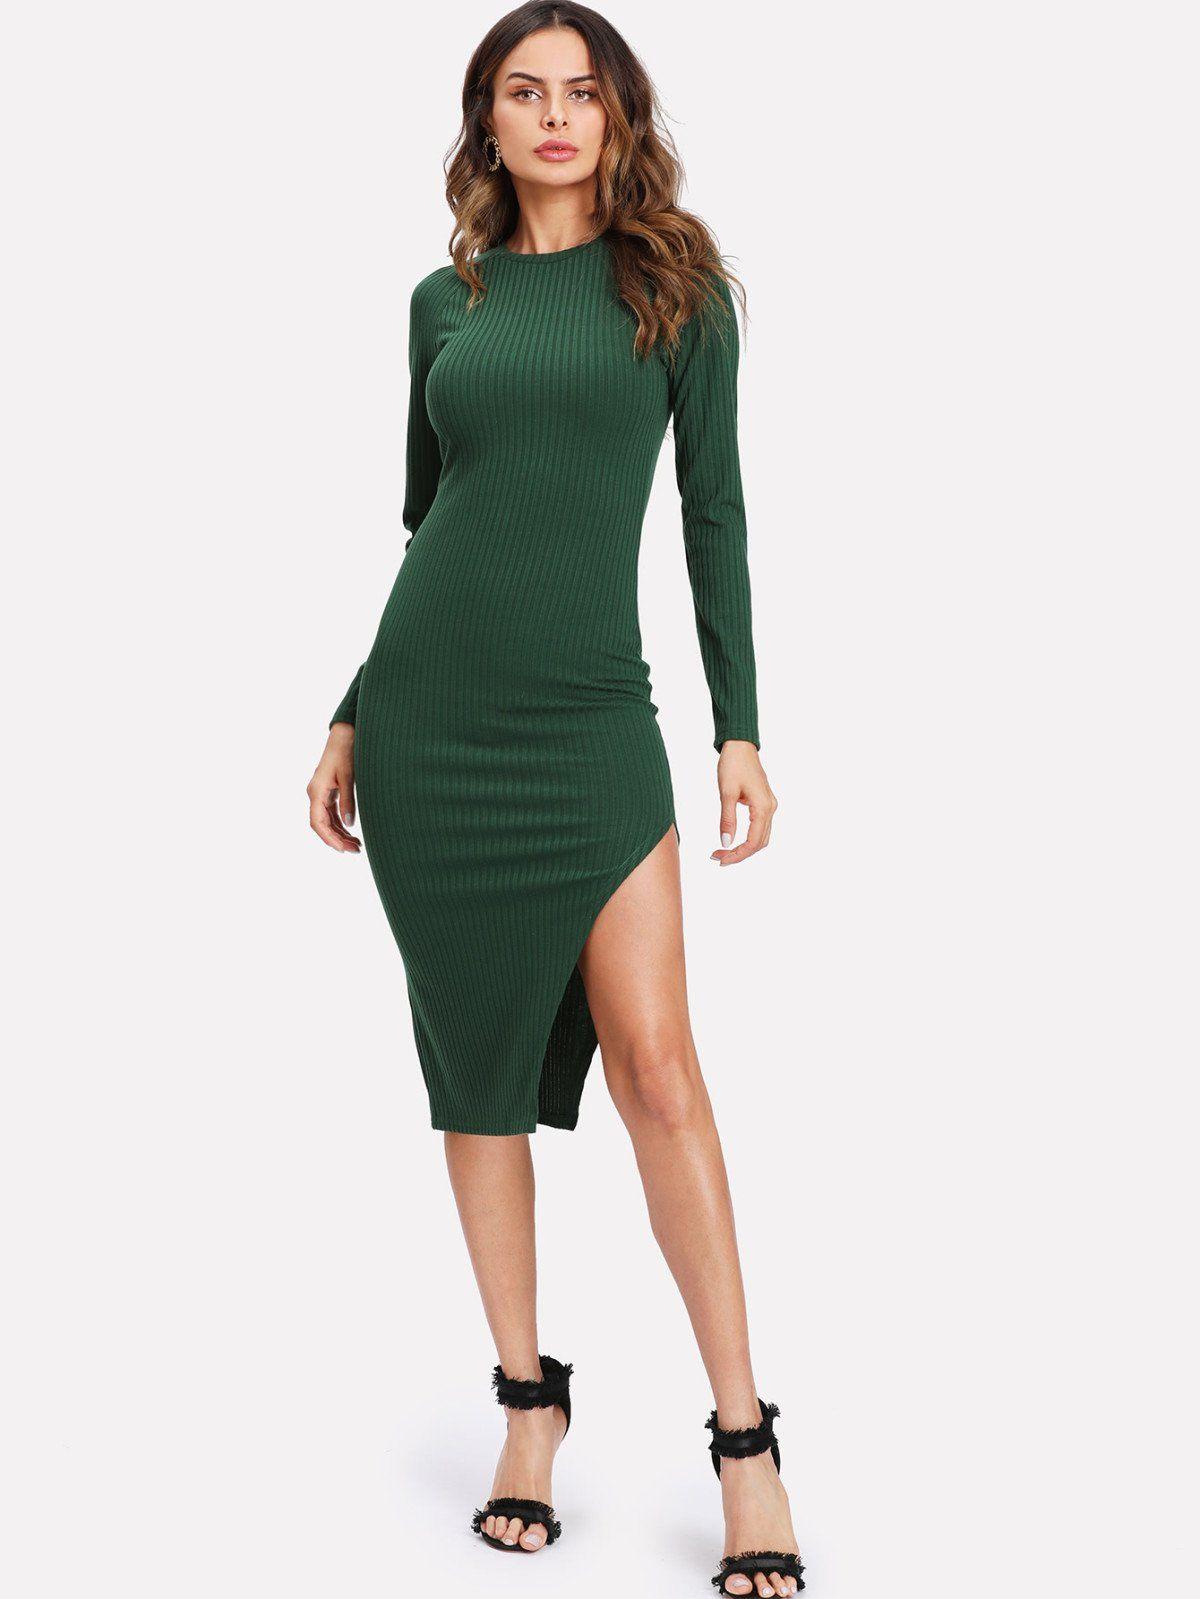 Green long sleeve cocktail dress  Asymmetrical Slit Hem Ribbed Knit Dress  Design trends Rib knit